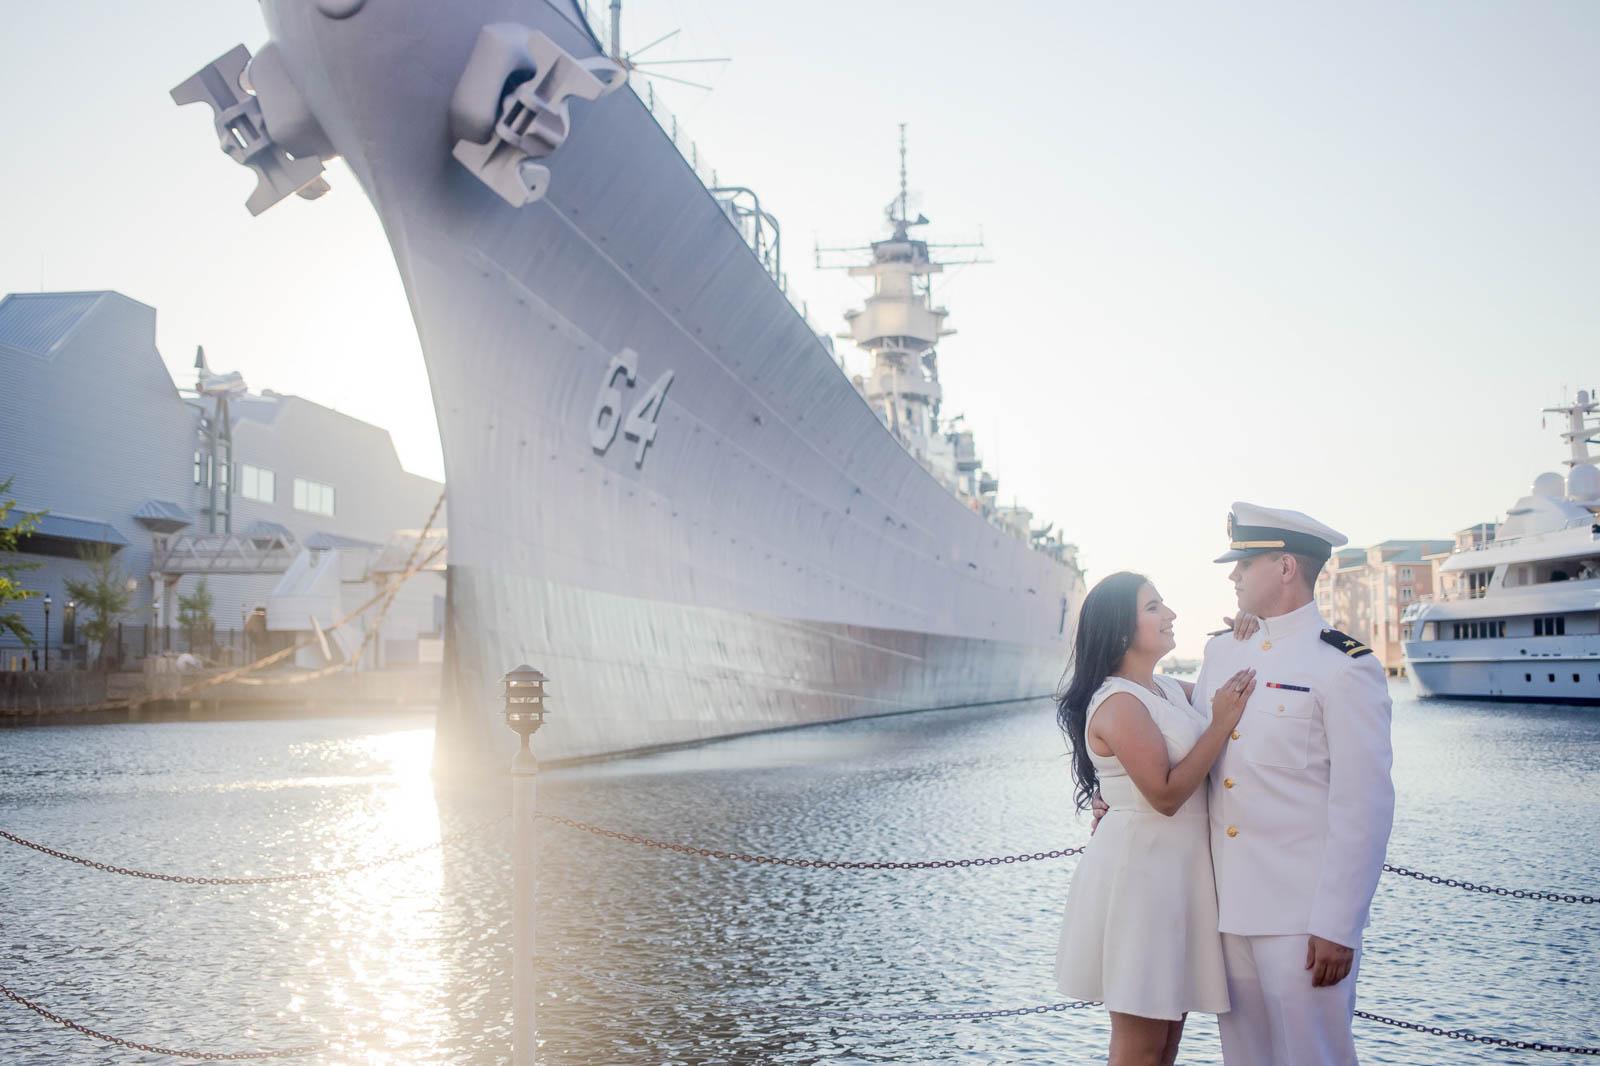 USS Constitution Engagement Photo